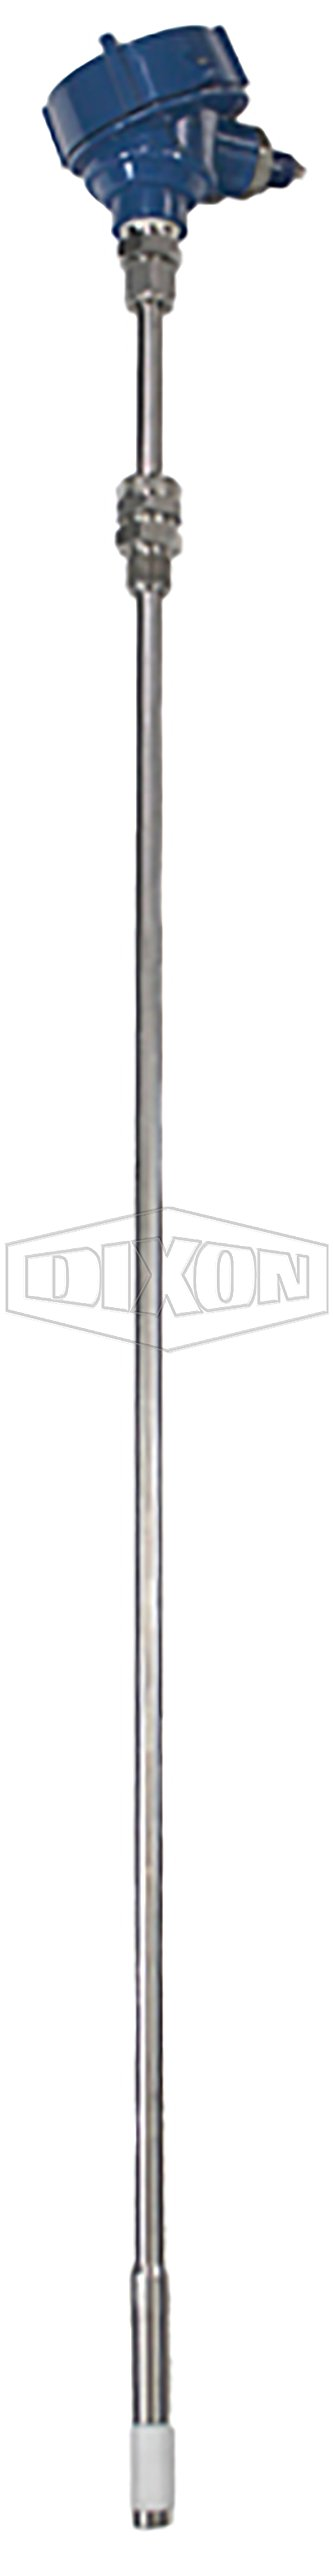 Dixon A200PHC96A ADS Spillguard Probe with  High Temperature Capacitance Sensor, 84'' Long, 1/2'' NPT Gland Standard